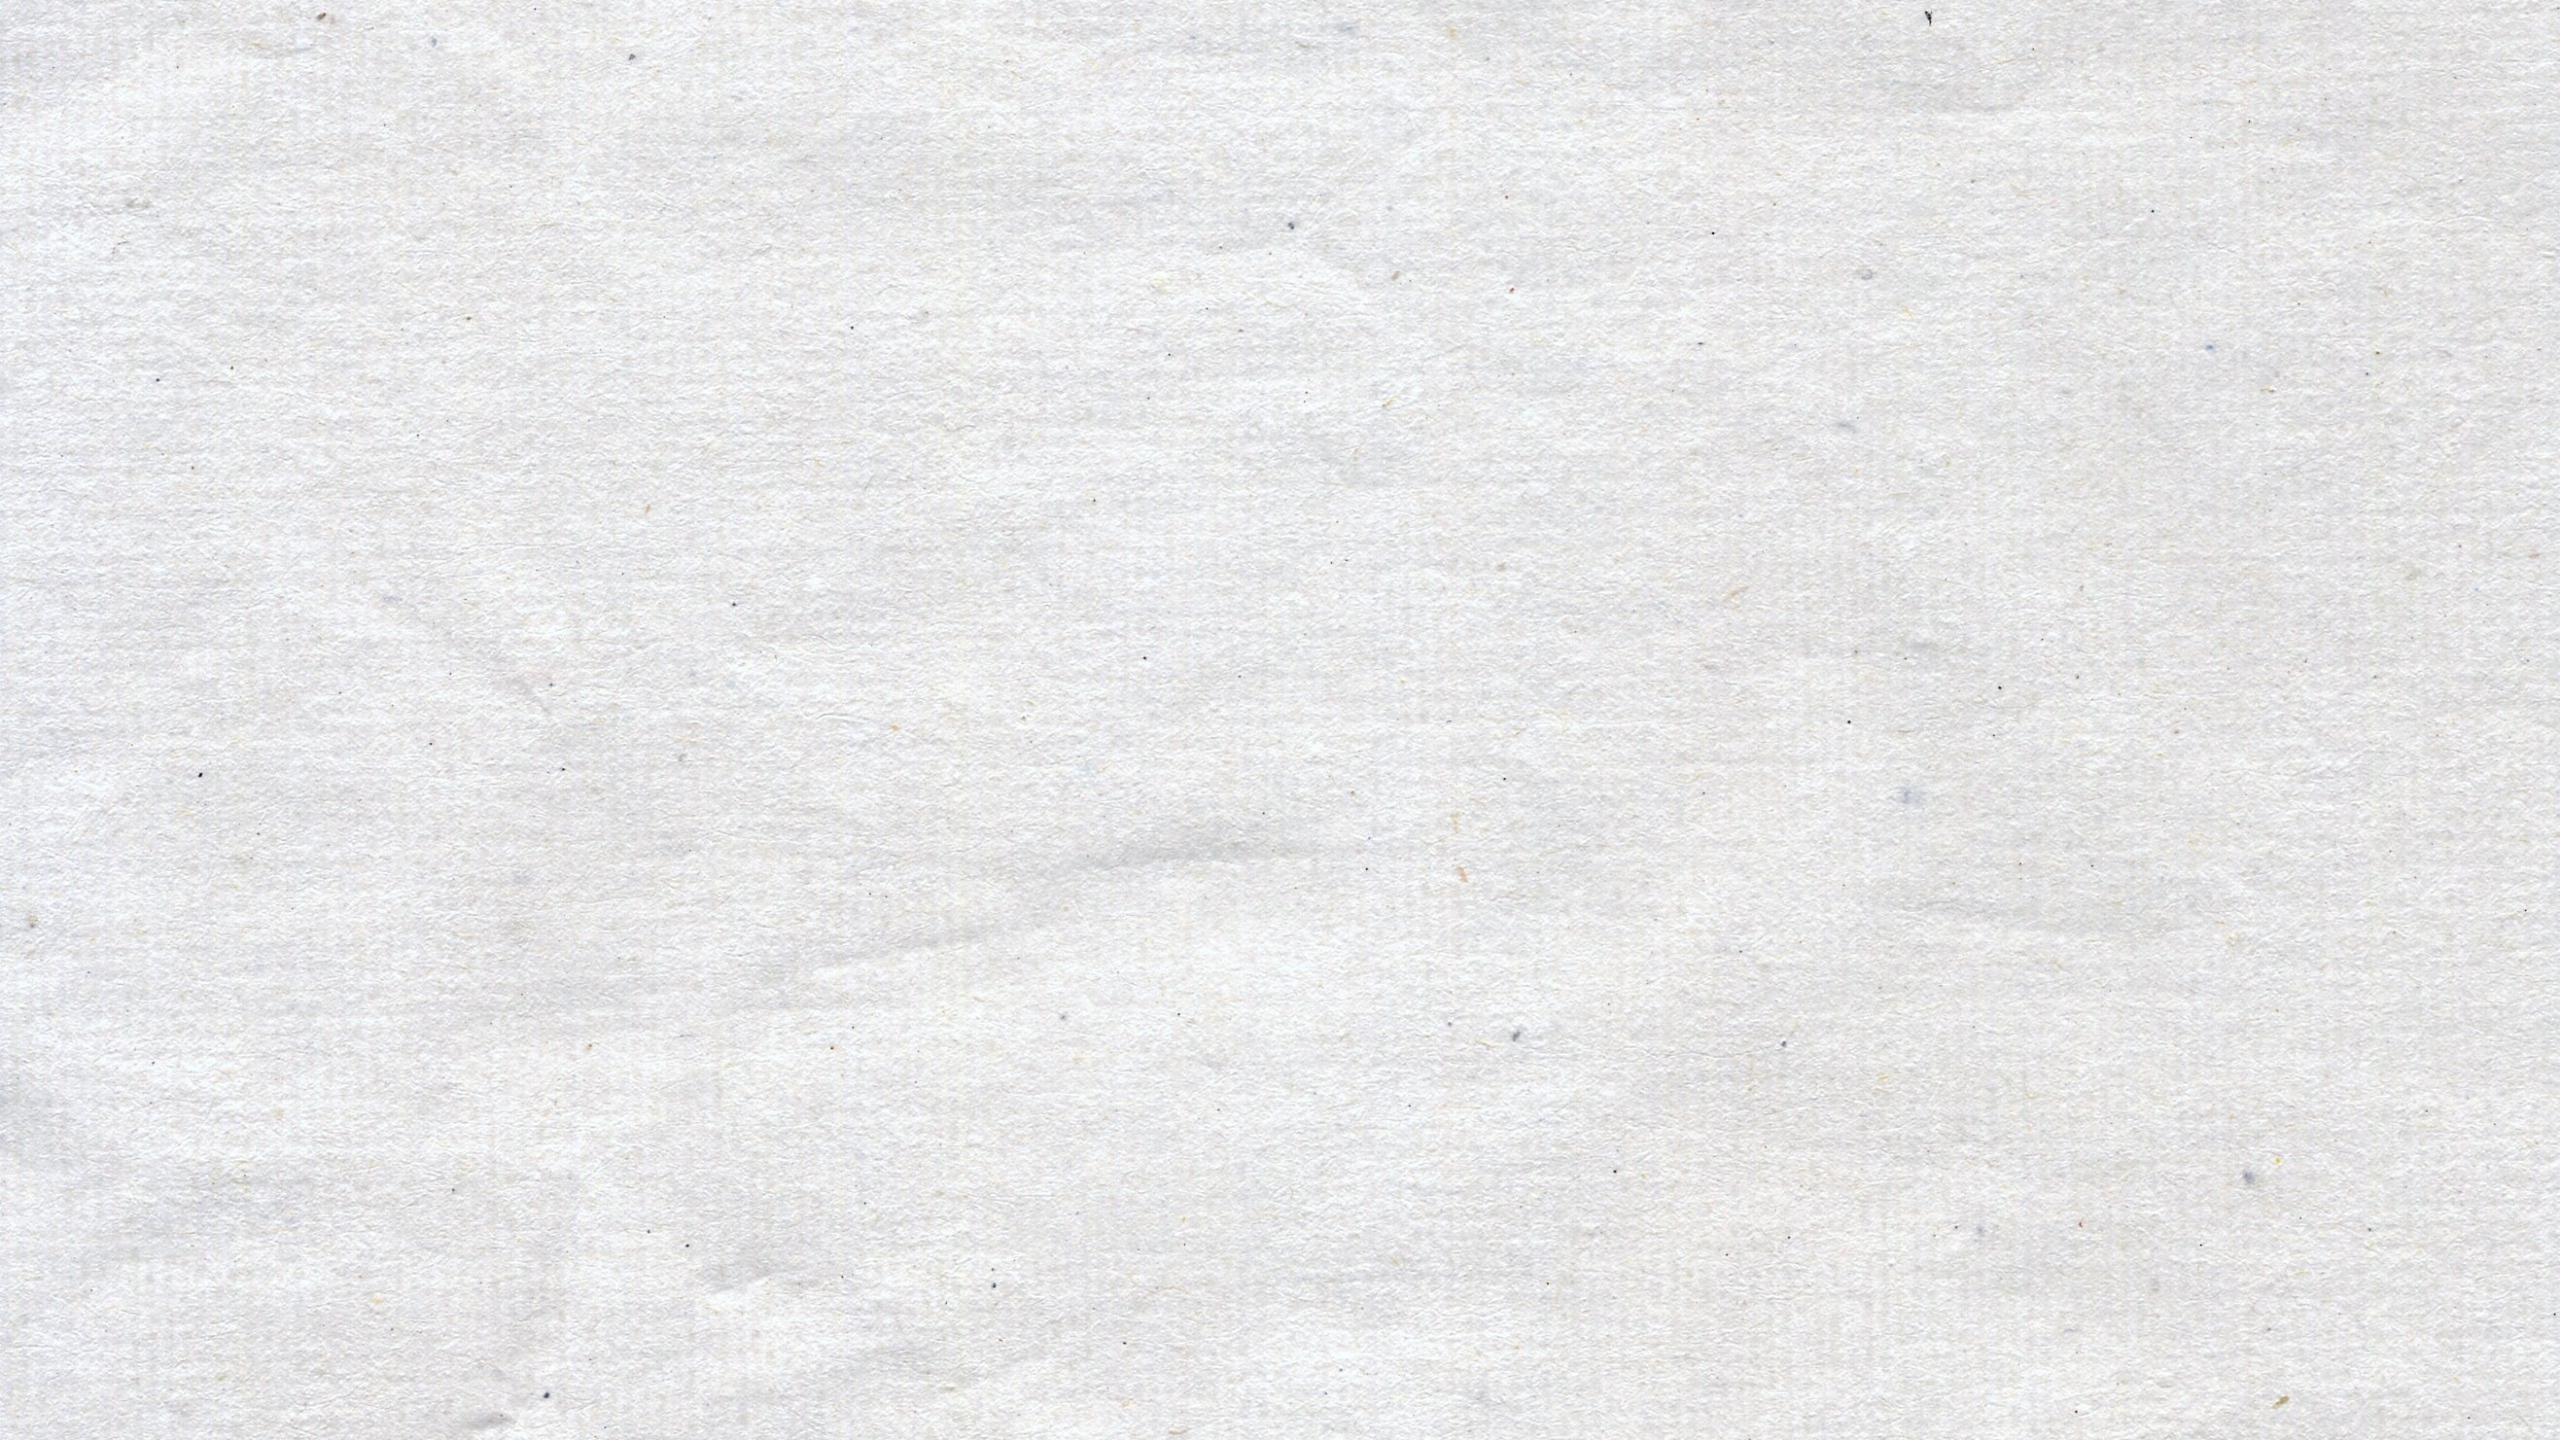 White Background Screensaver